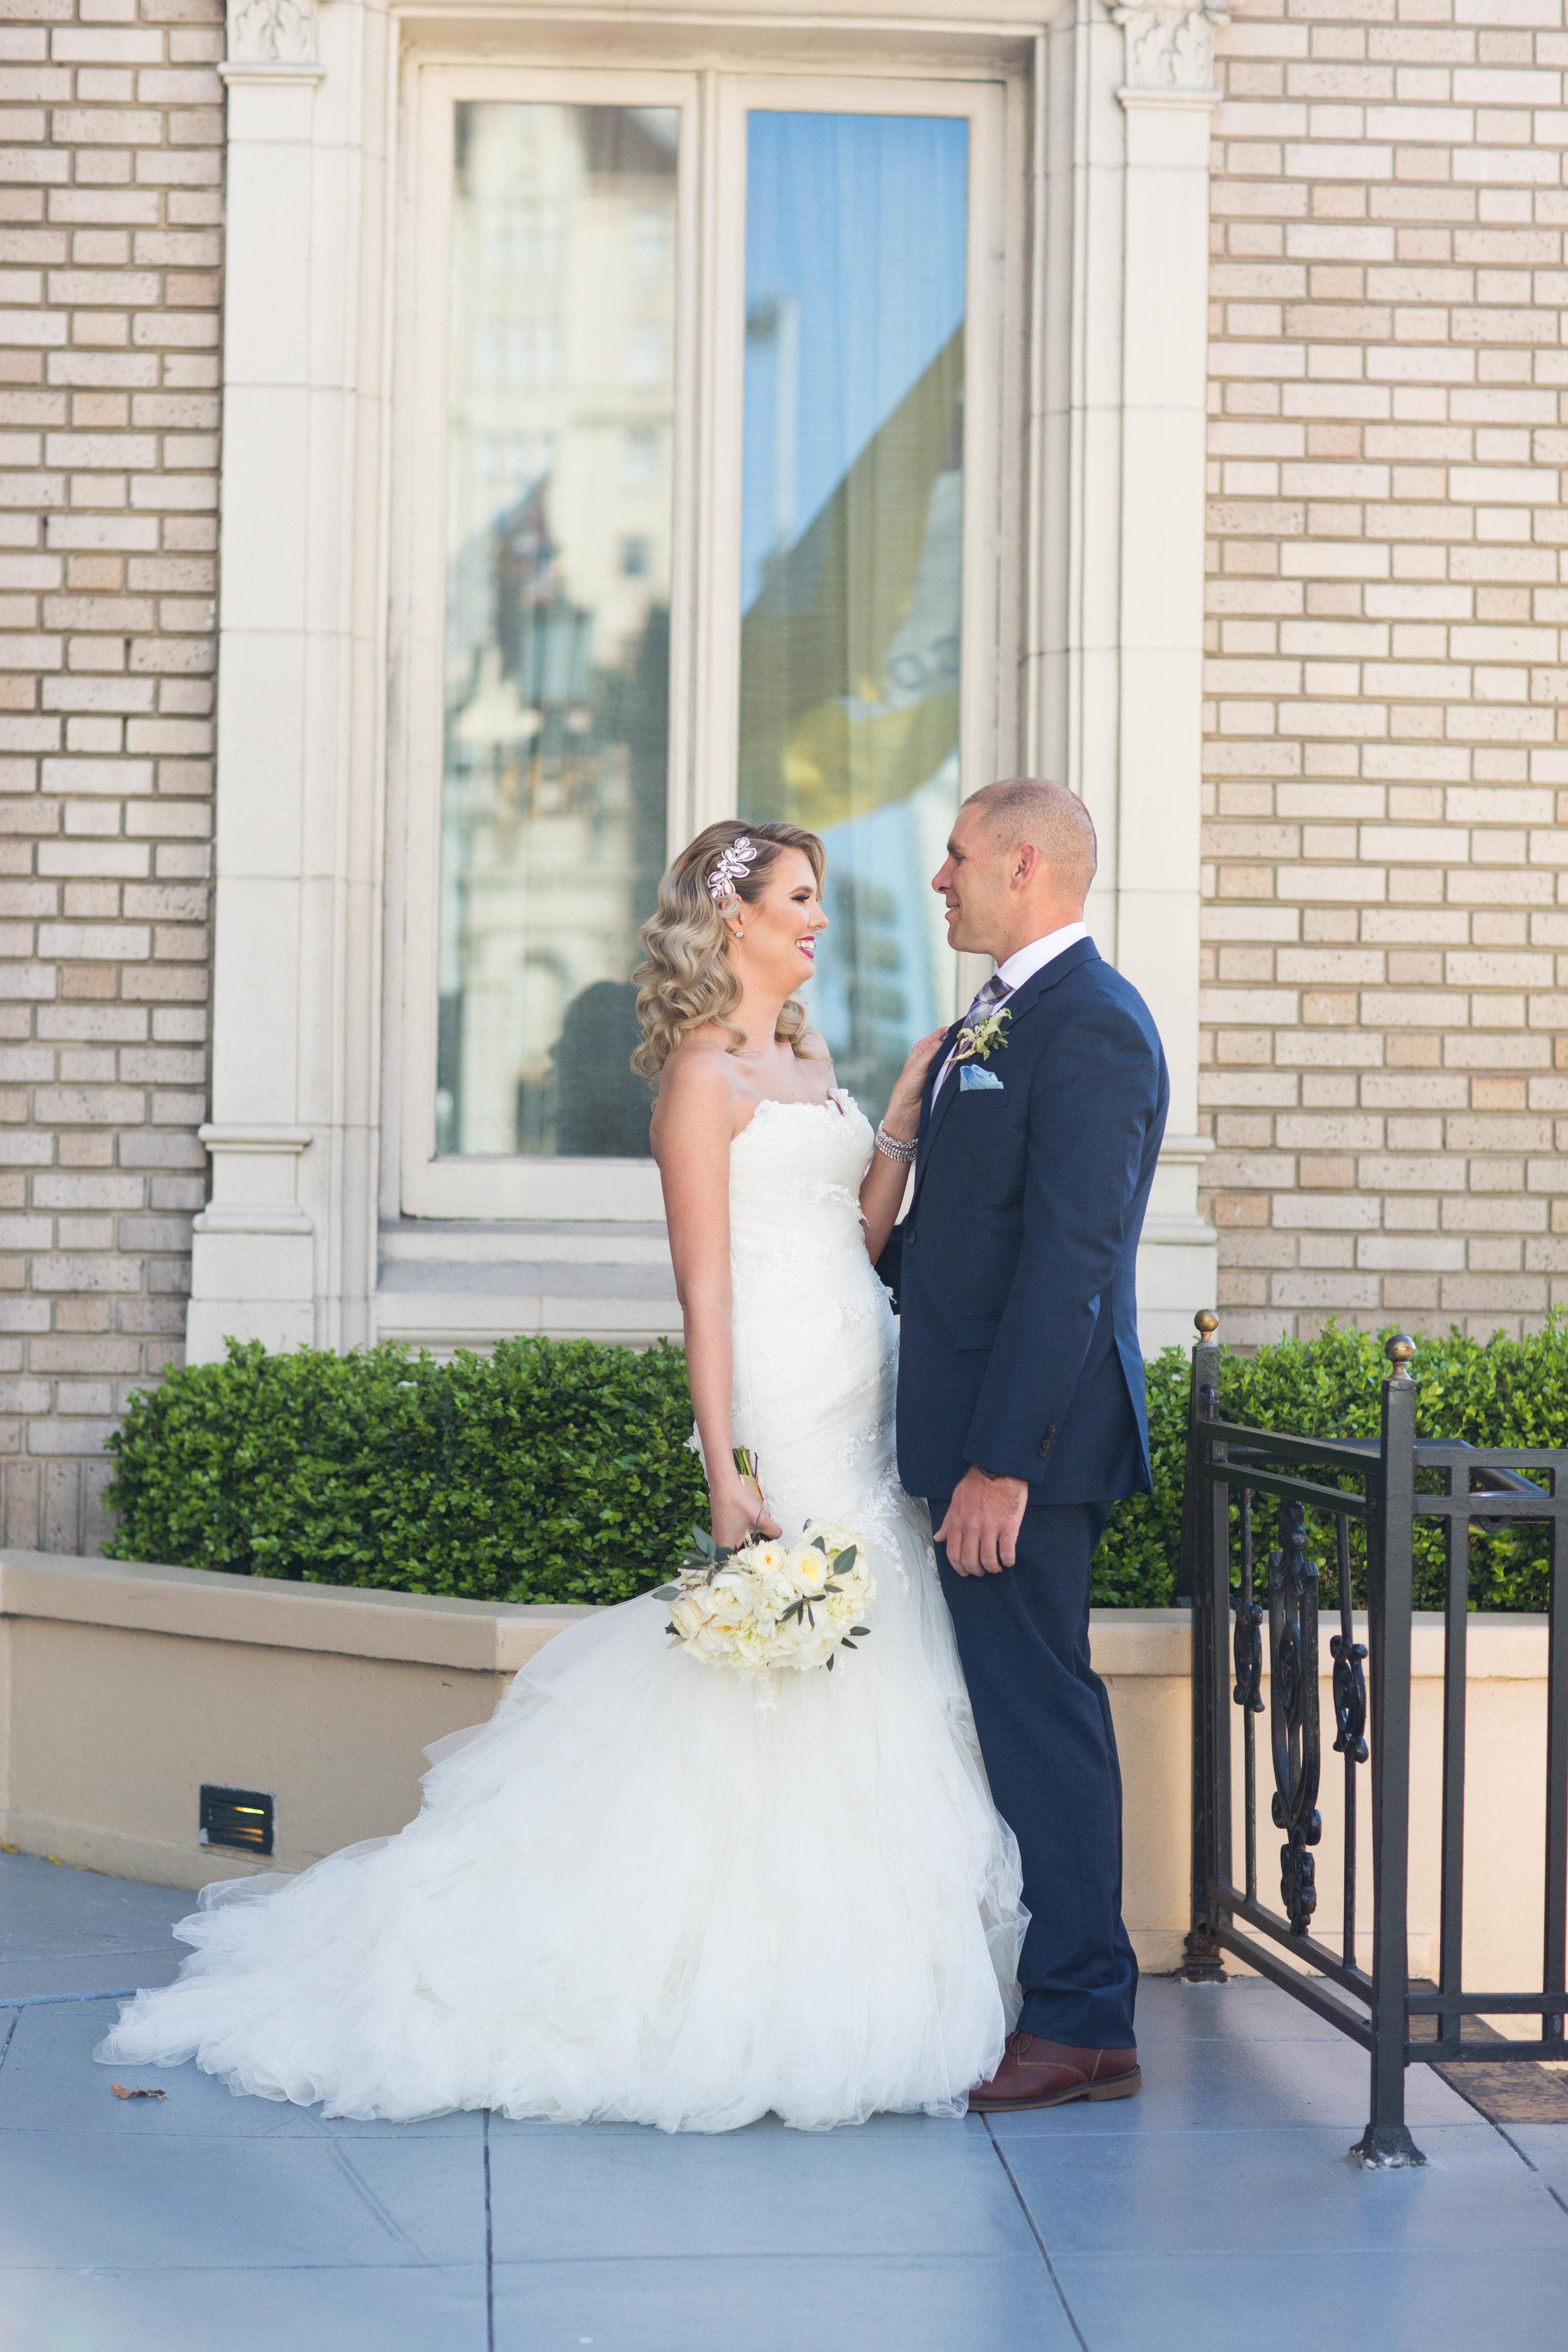 san-francisco-city-hall-wedding-kimberly-macdonald-photography220 copy.jpg